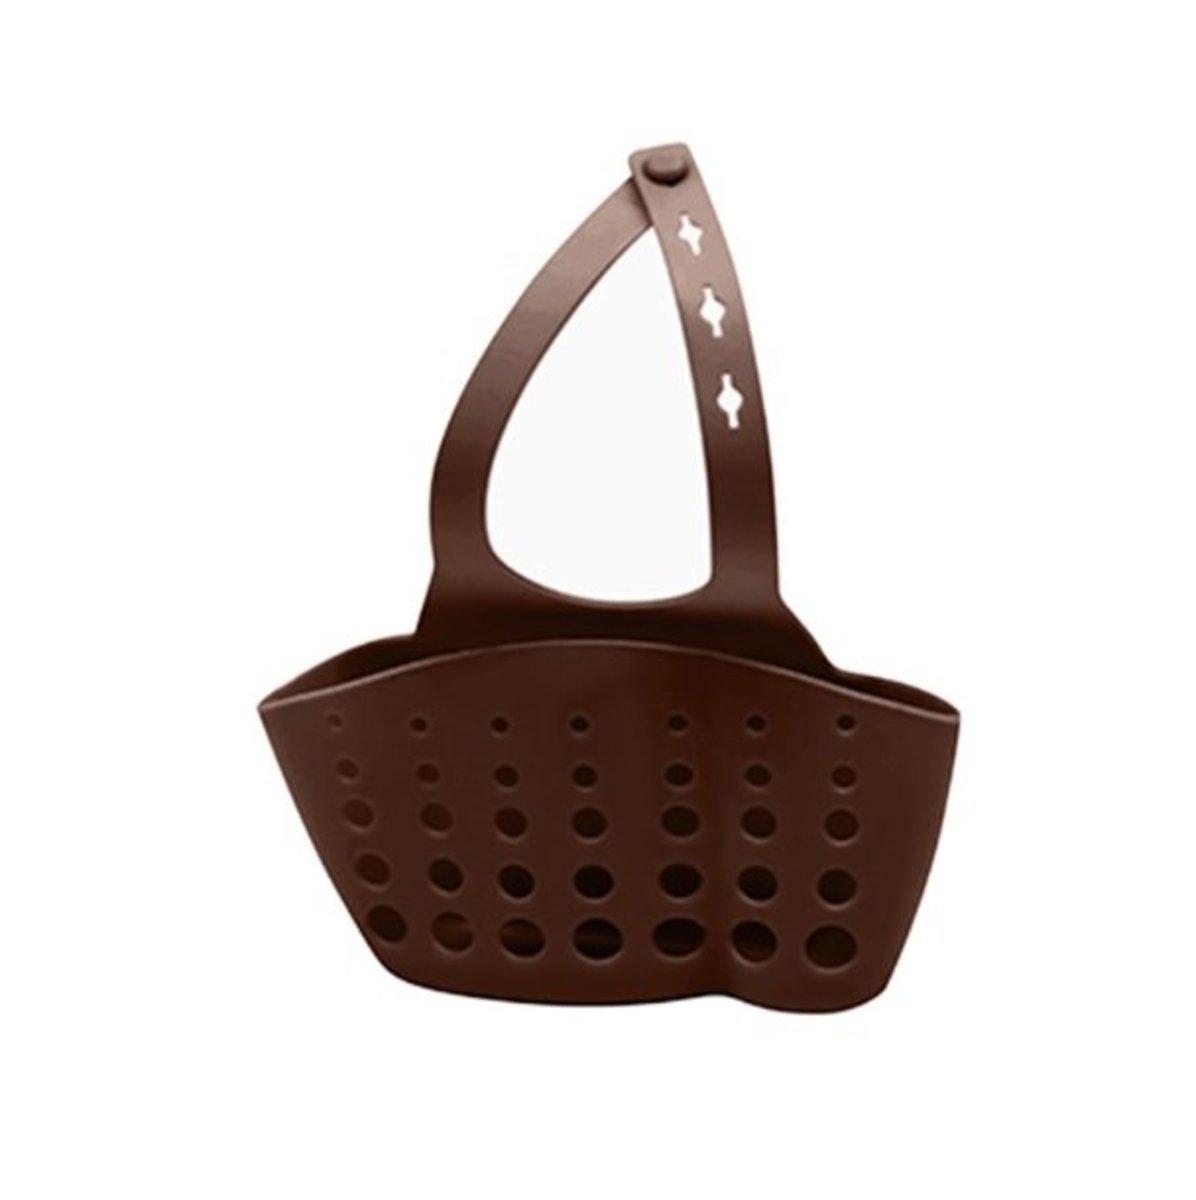 sink storage basket (brown) (length 10x width 4x height 8cm)